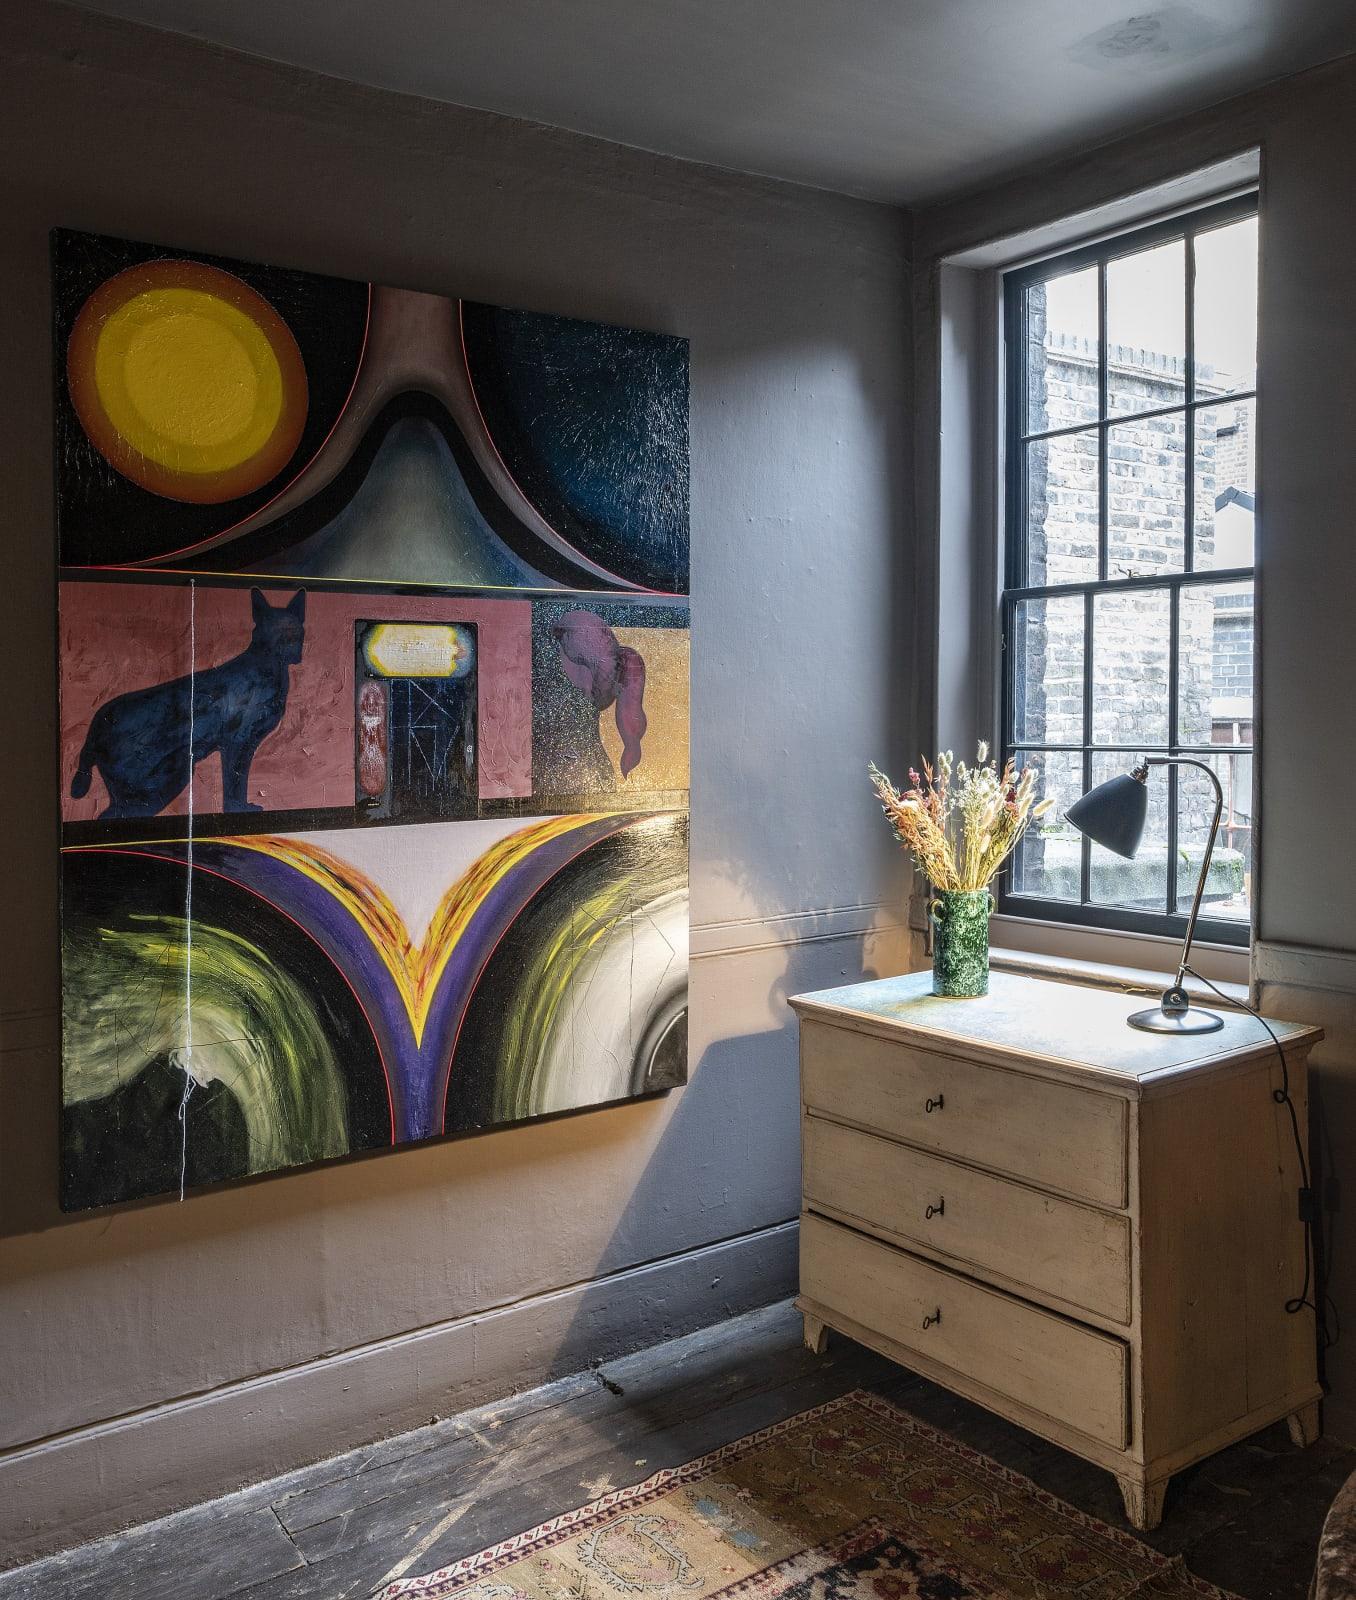 Installation view, Room 2, 2020.